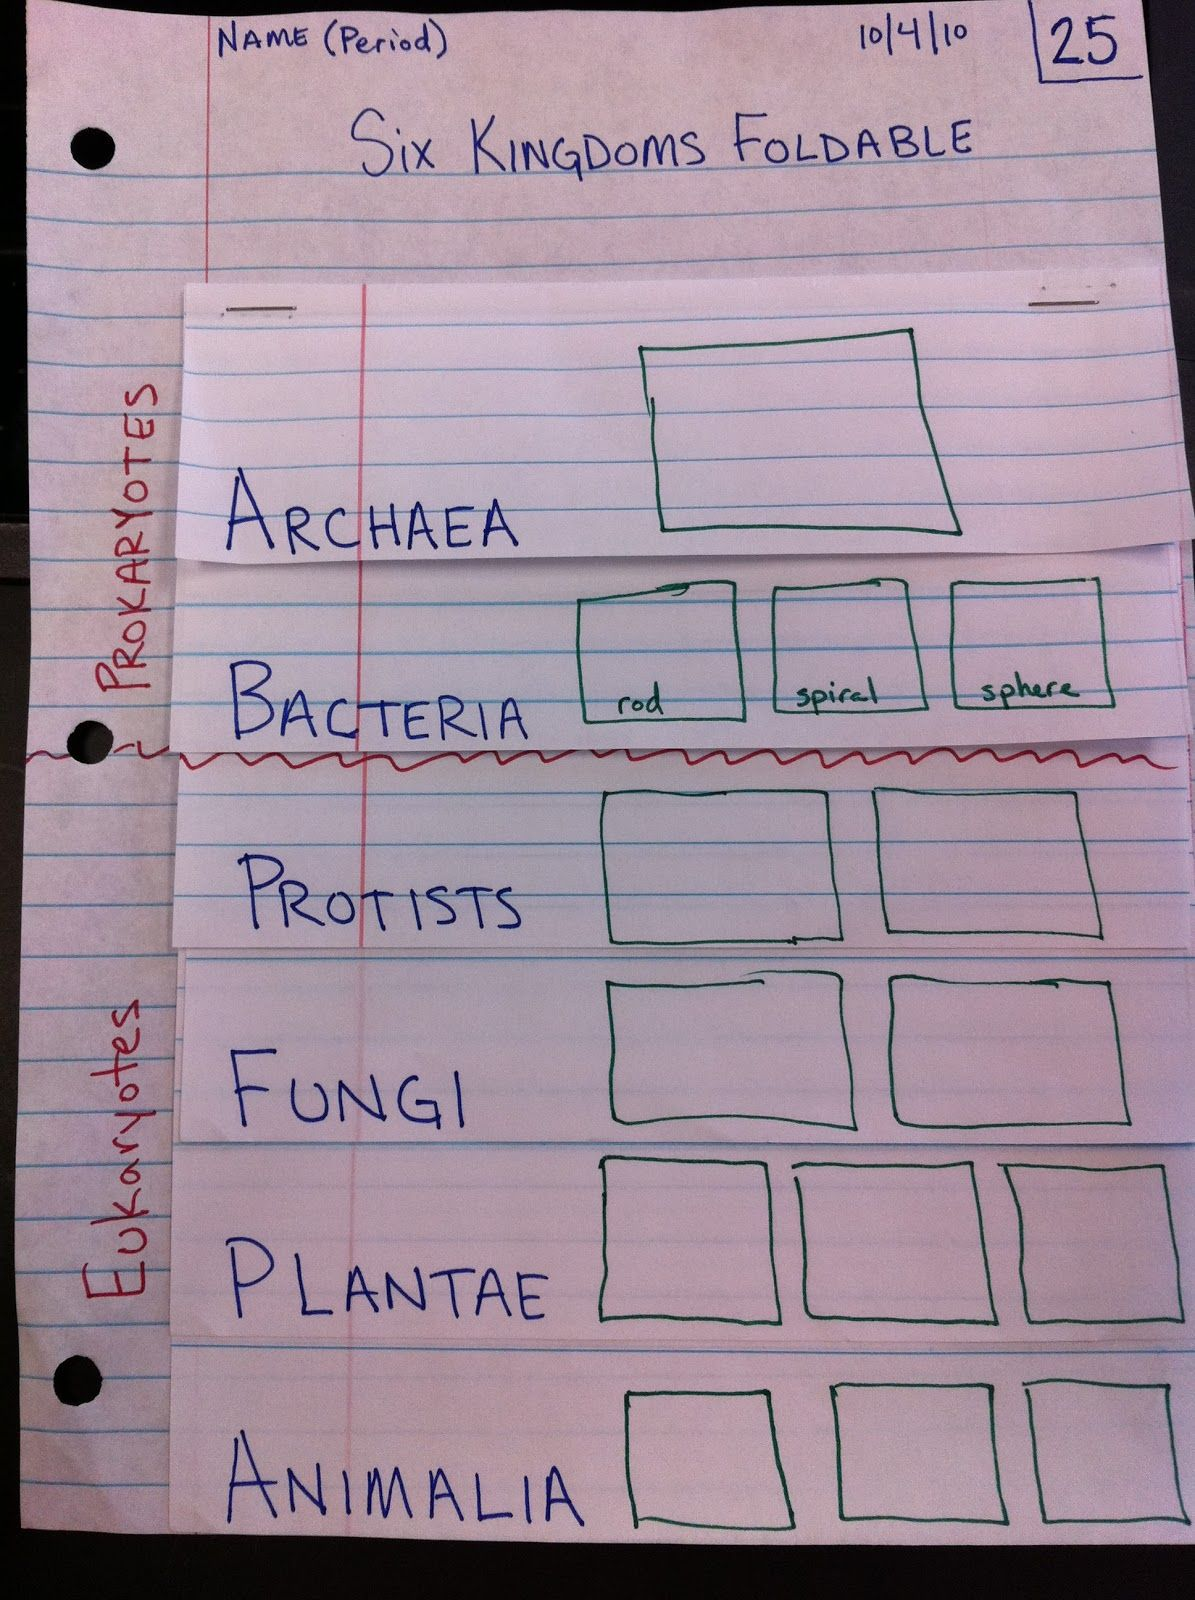 Garner 6th Grade Science Blog SIx Kingdoms Foldable (With